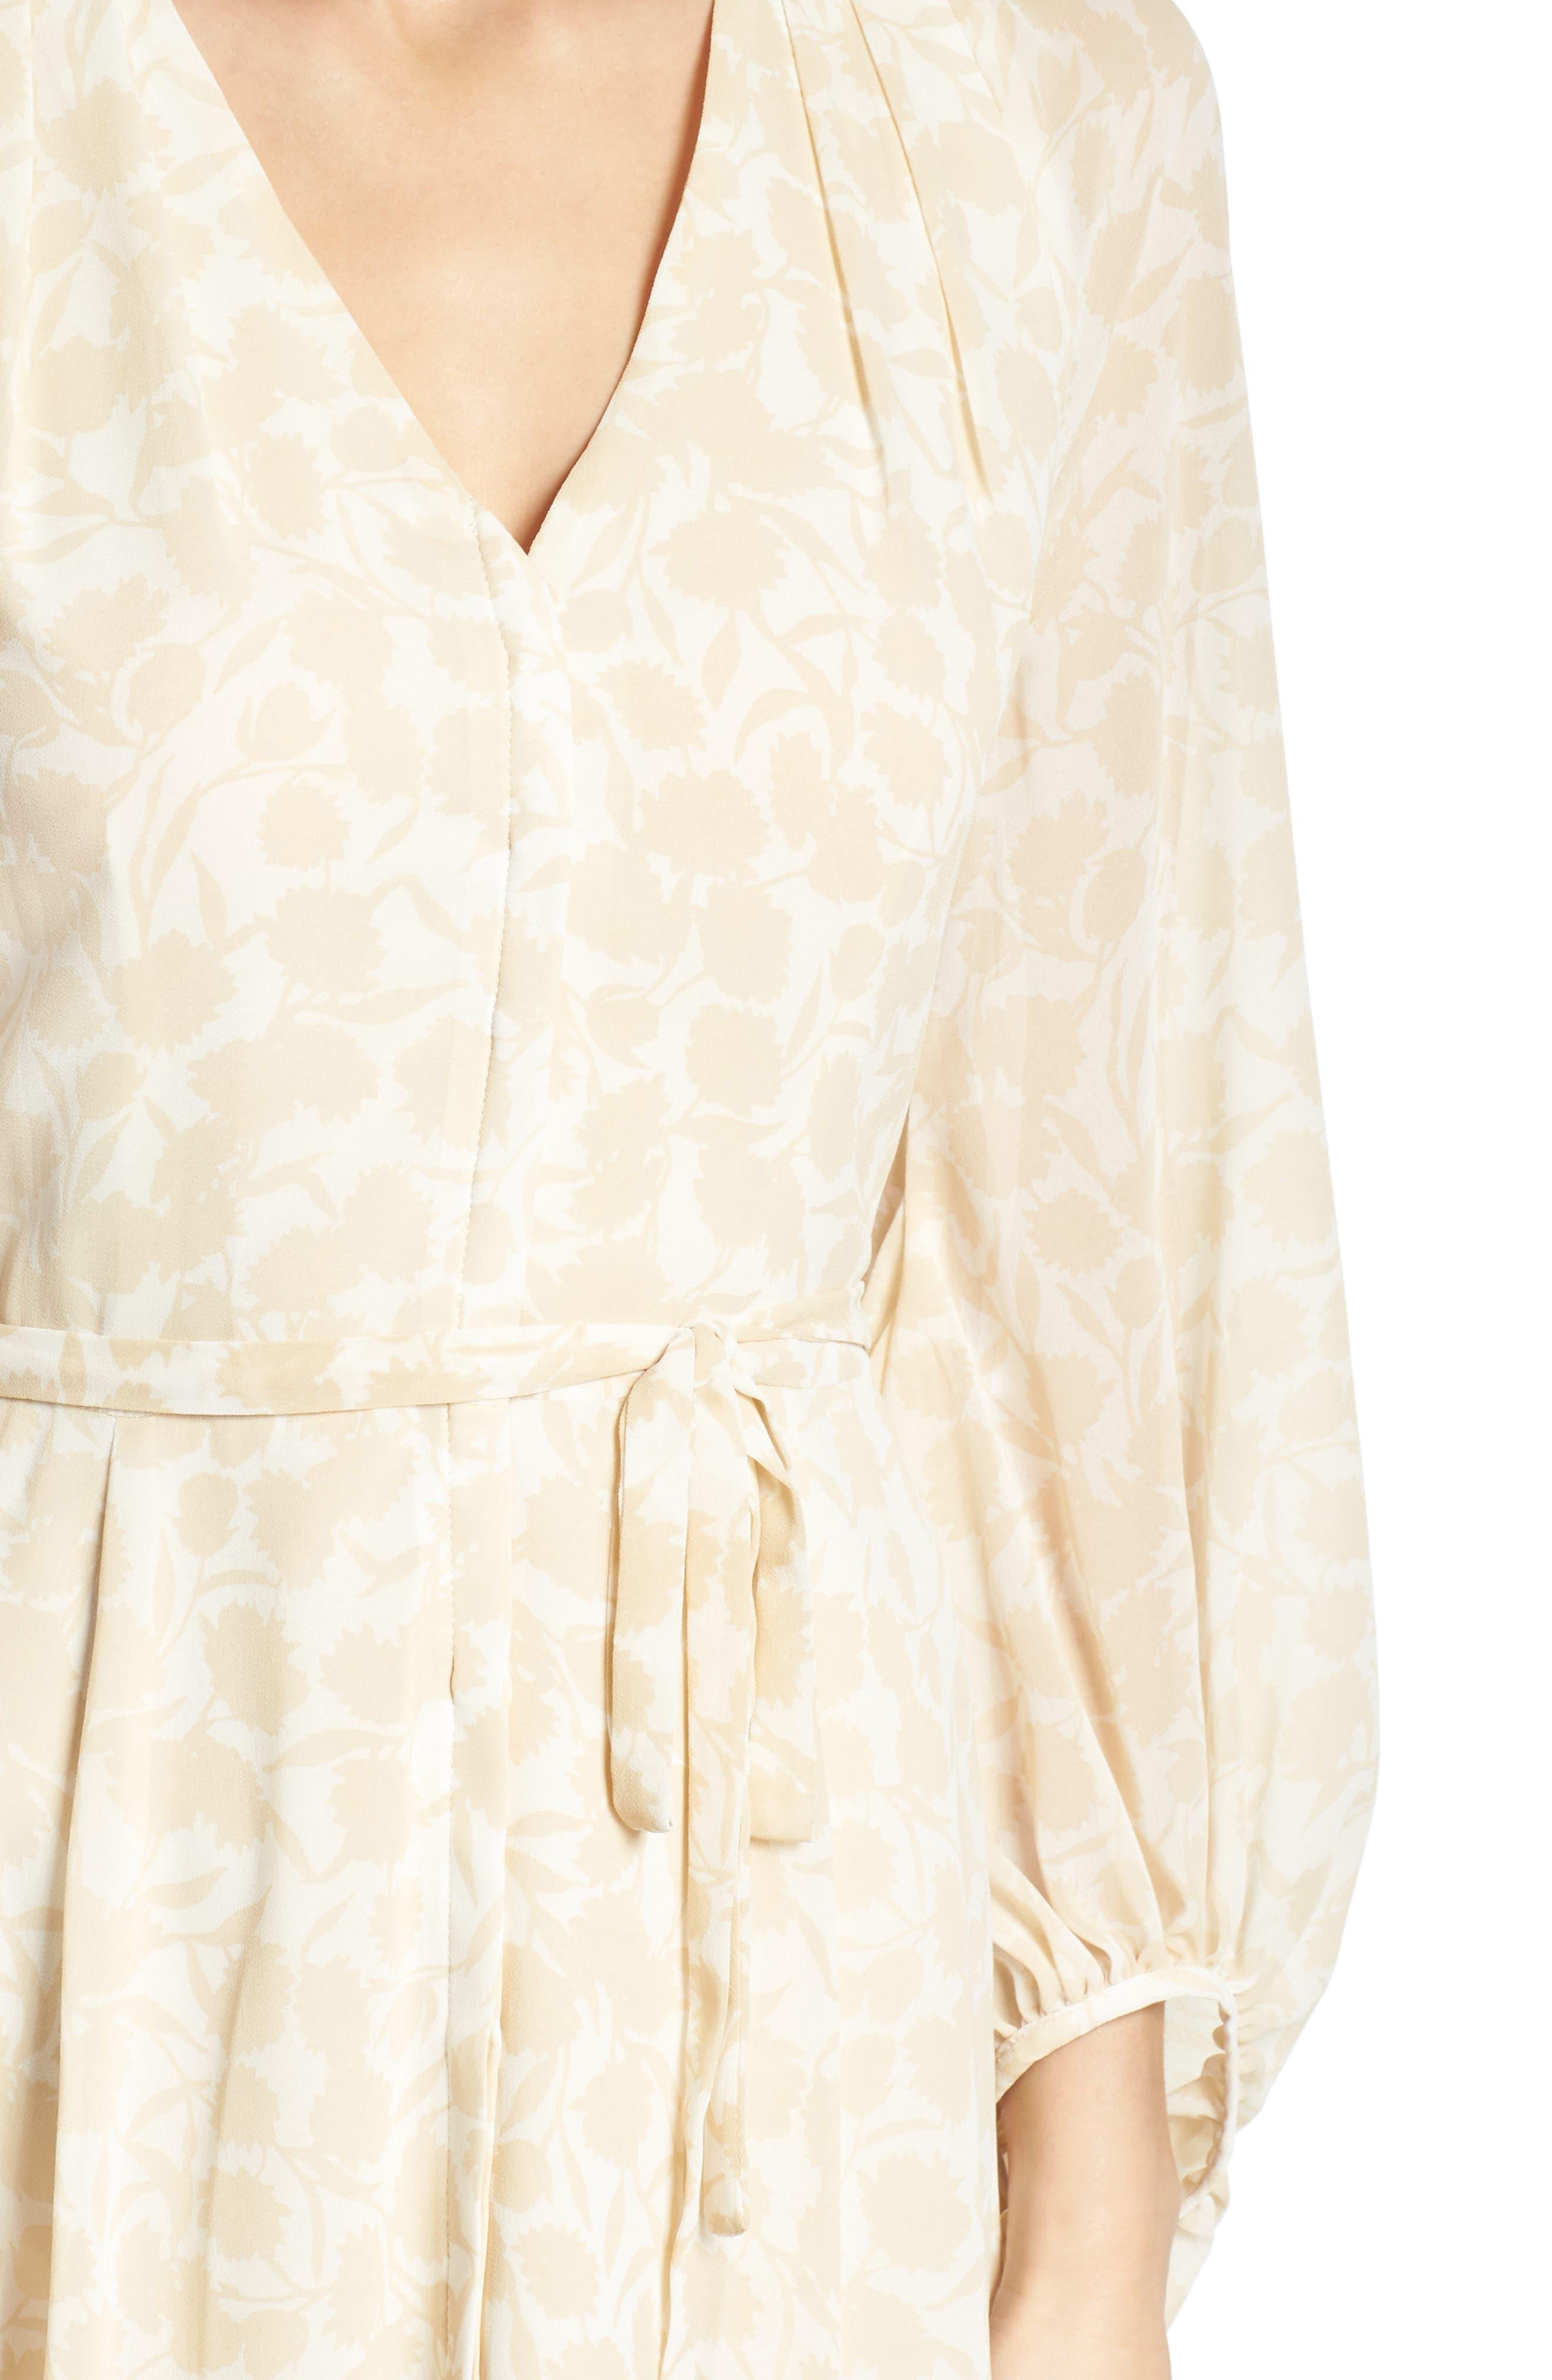 Esther Shadow Branch Chiffon Dress,                             Alternate thumbnail 6, color,                             Cream Combo